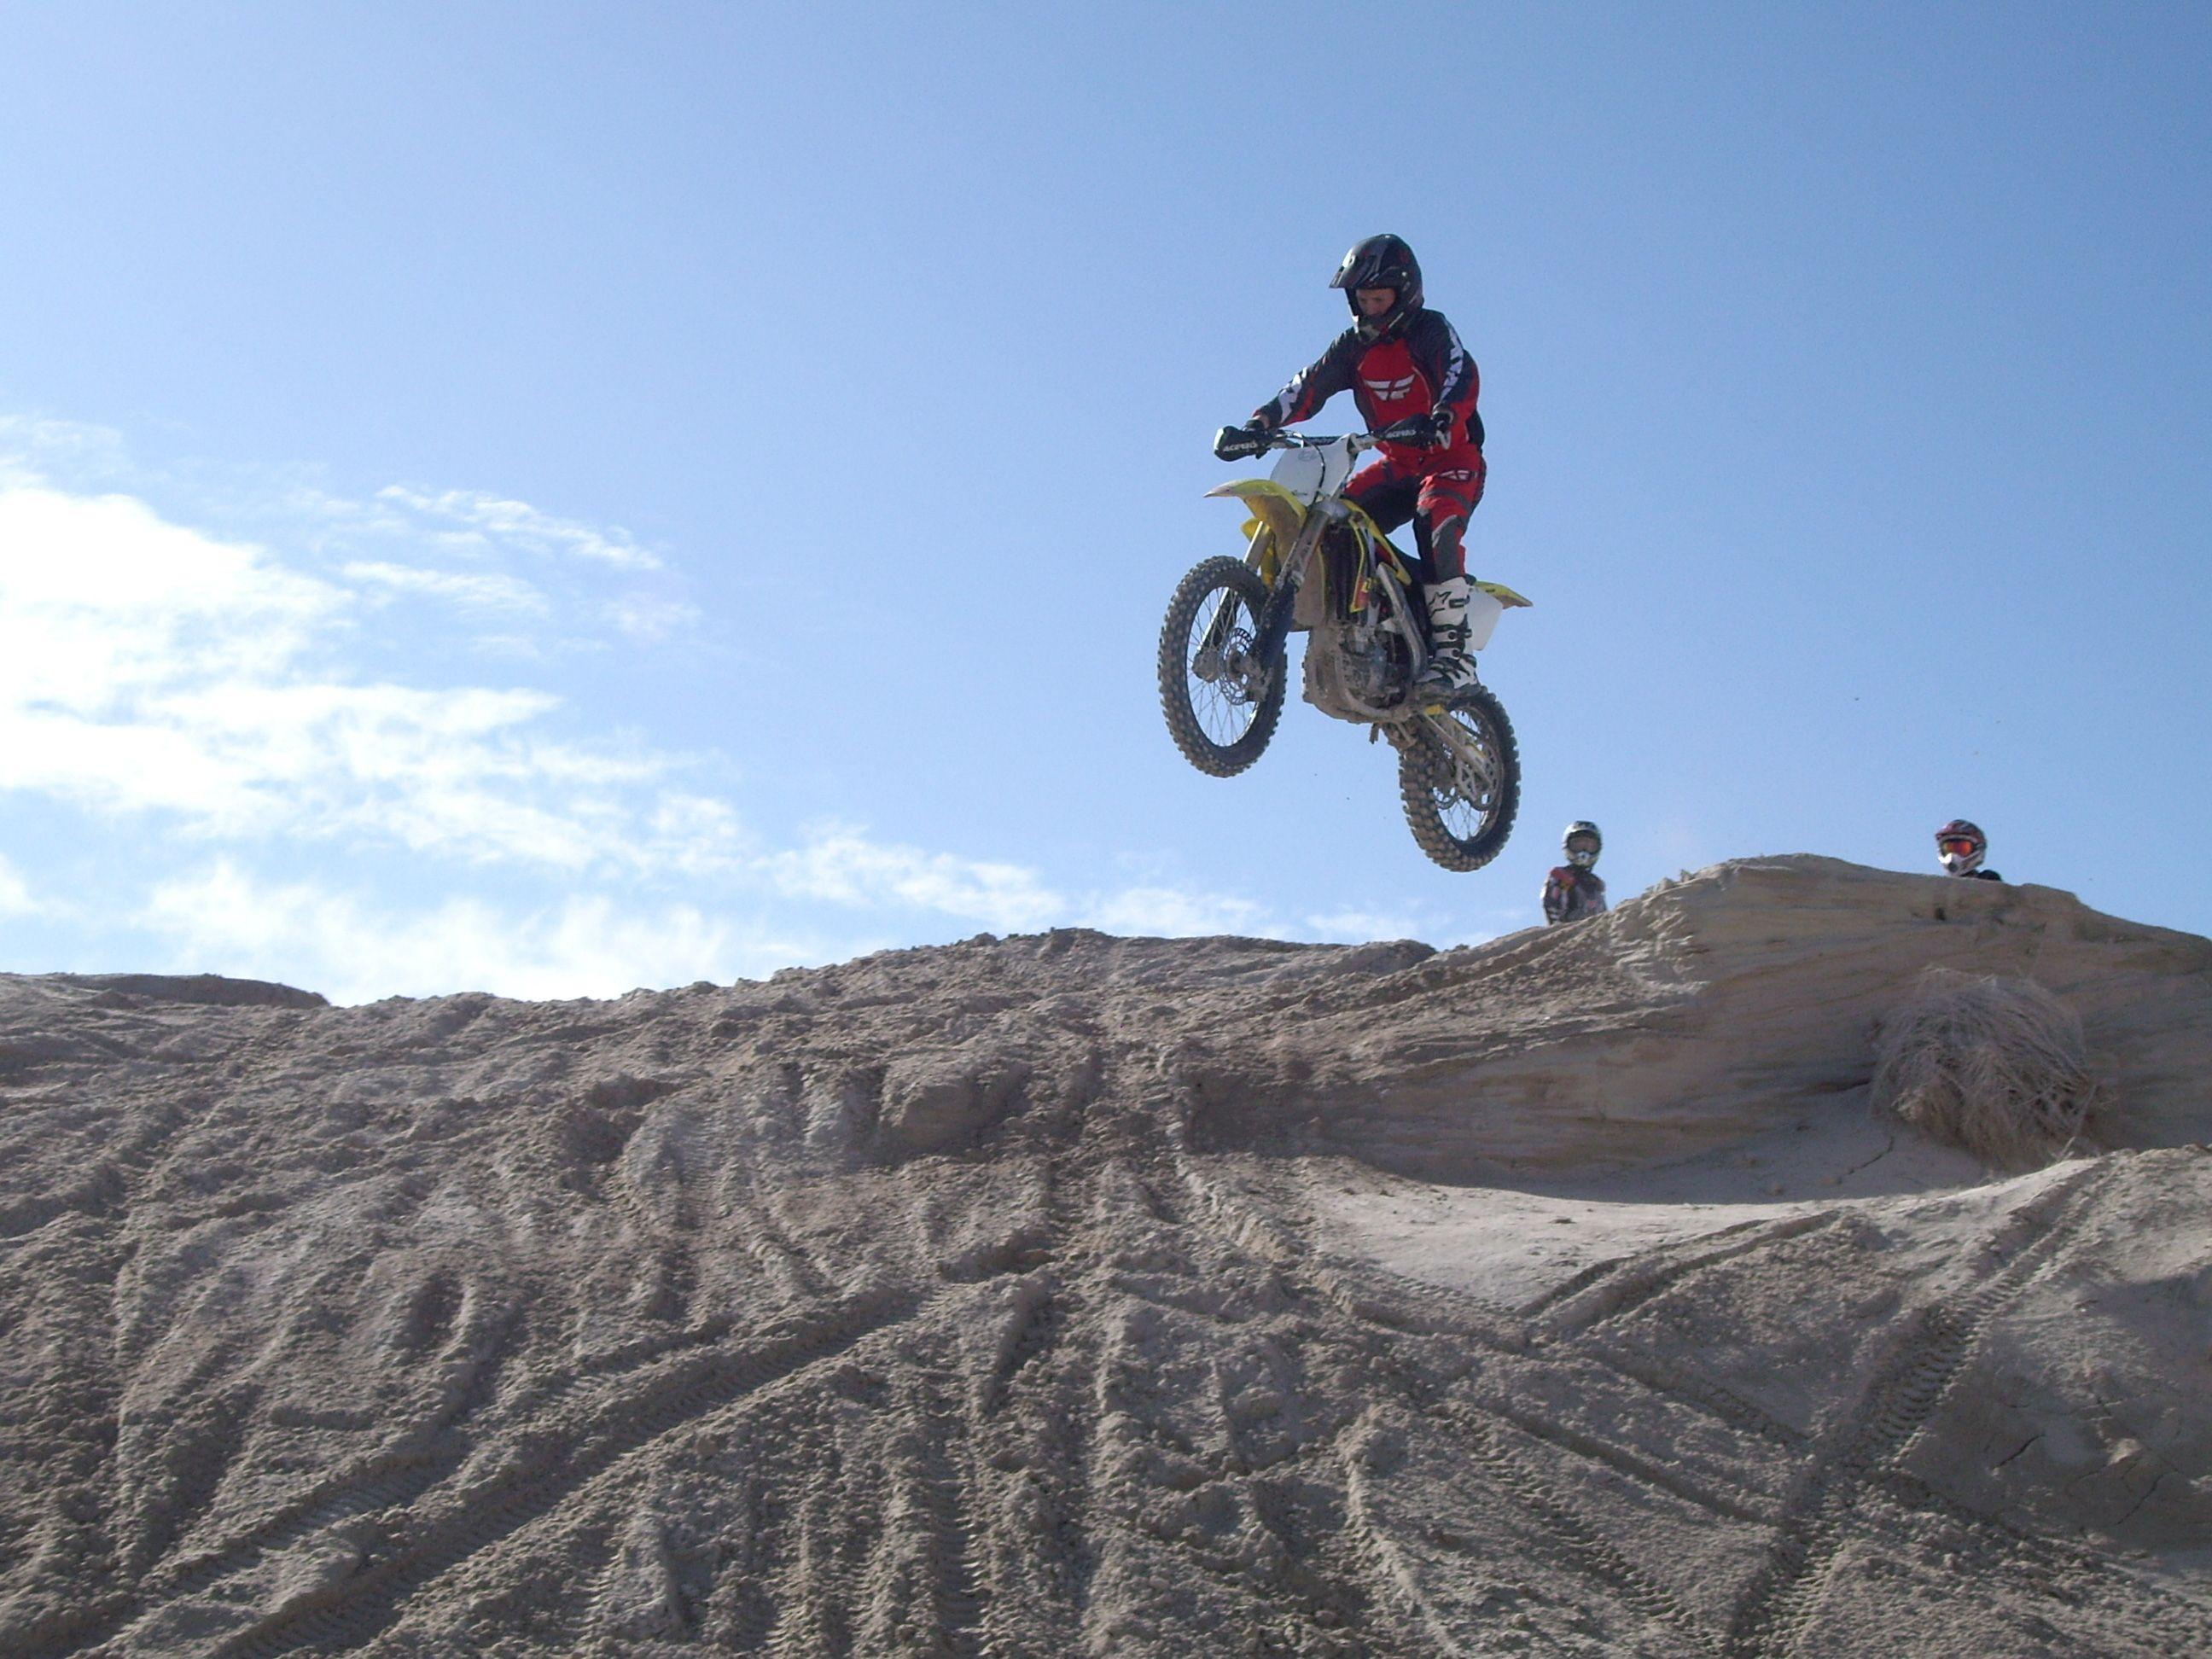 Knolls Ohv Area Dirt Bike Jump Dirt Bike State Parks Dune